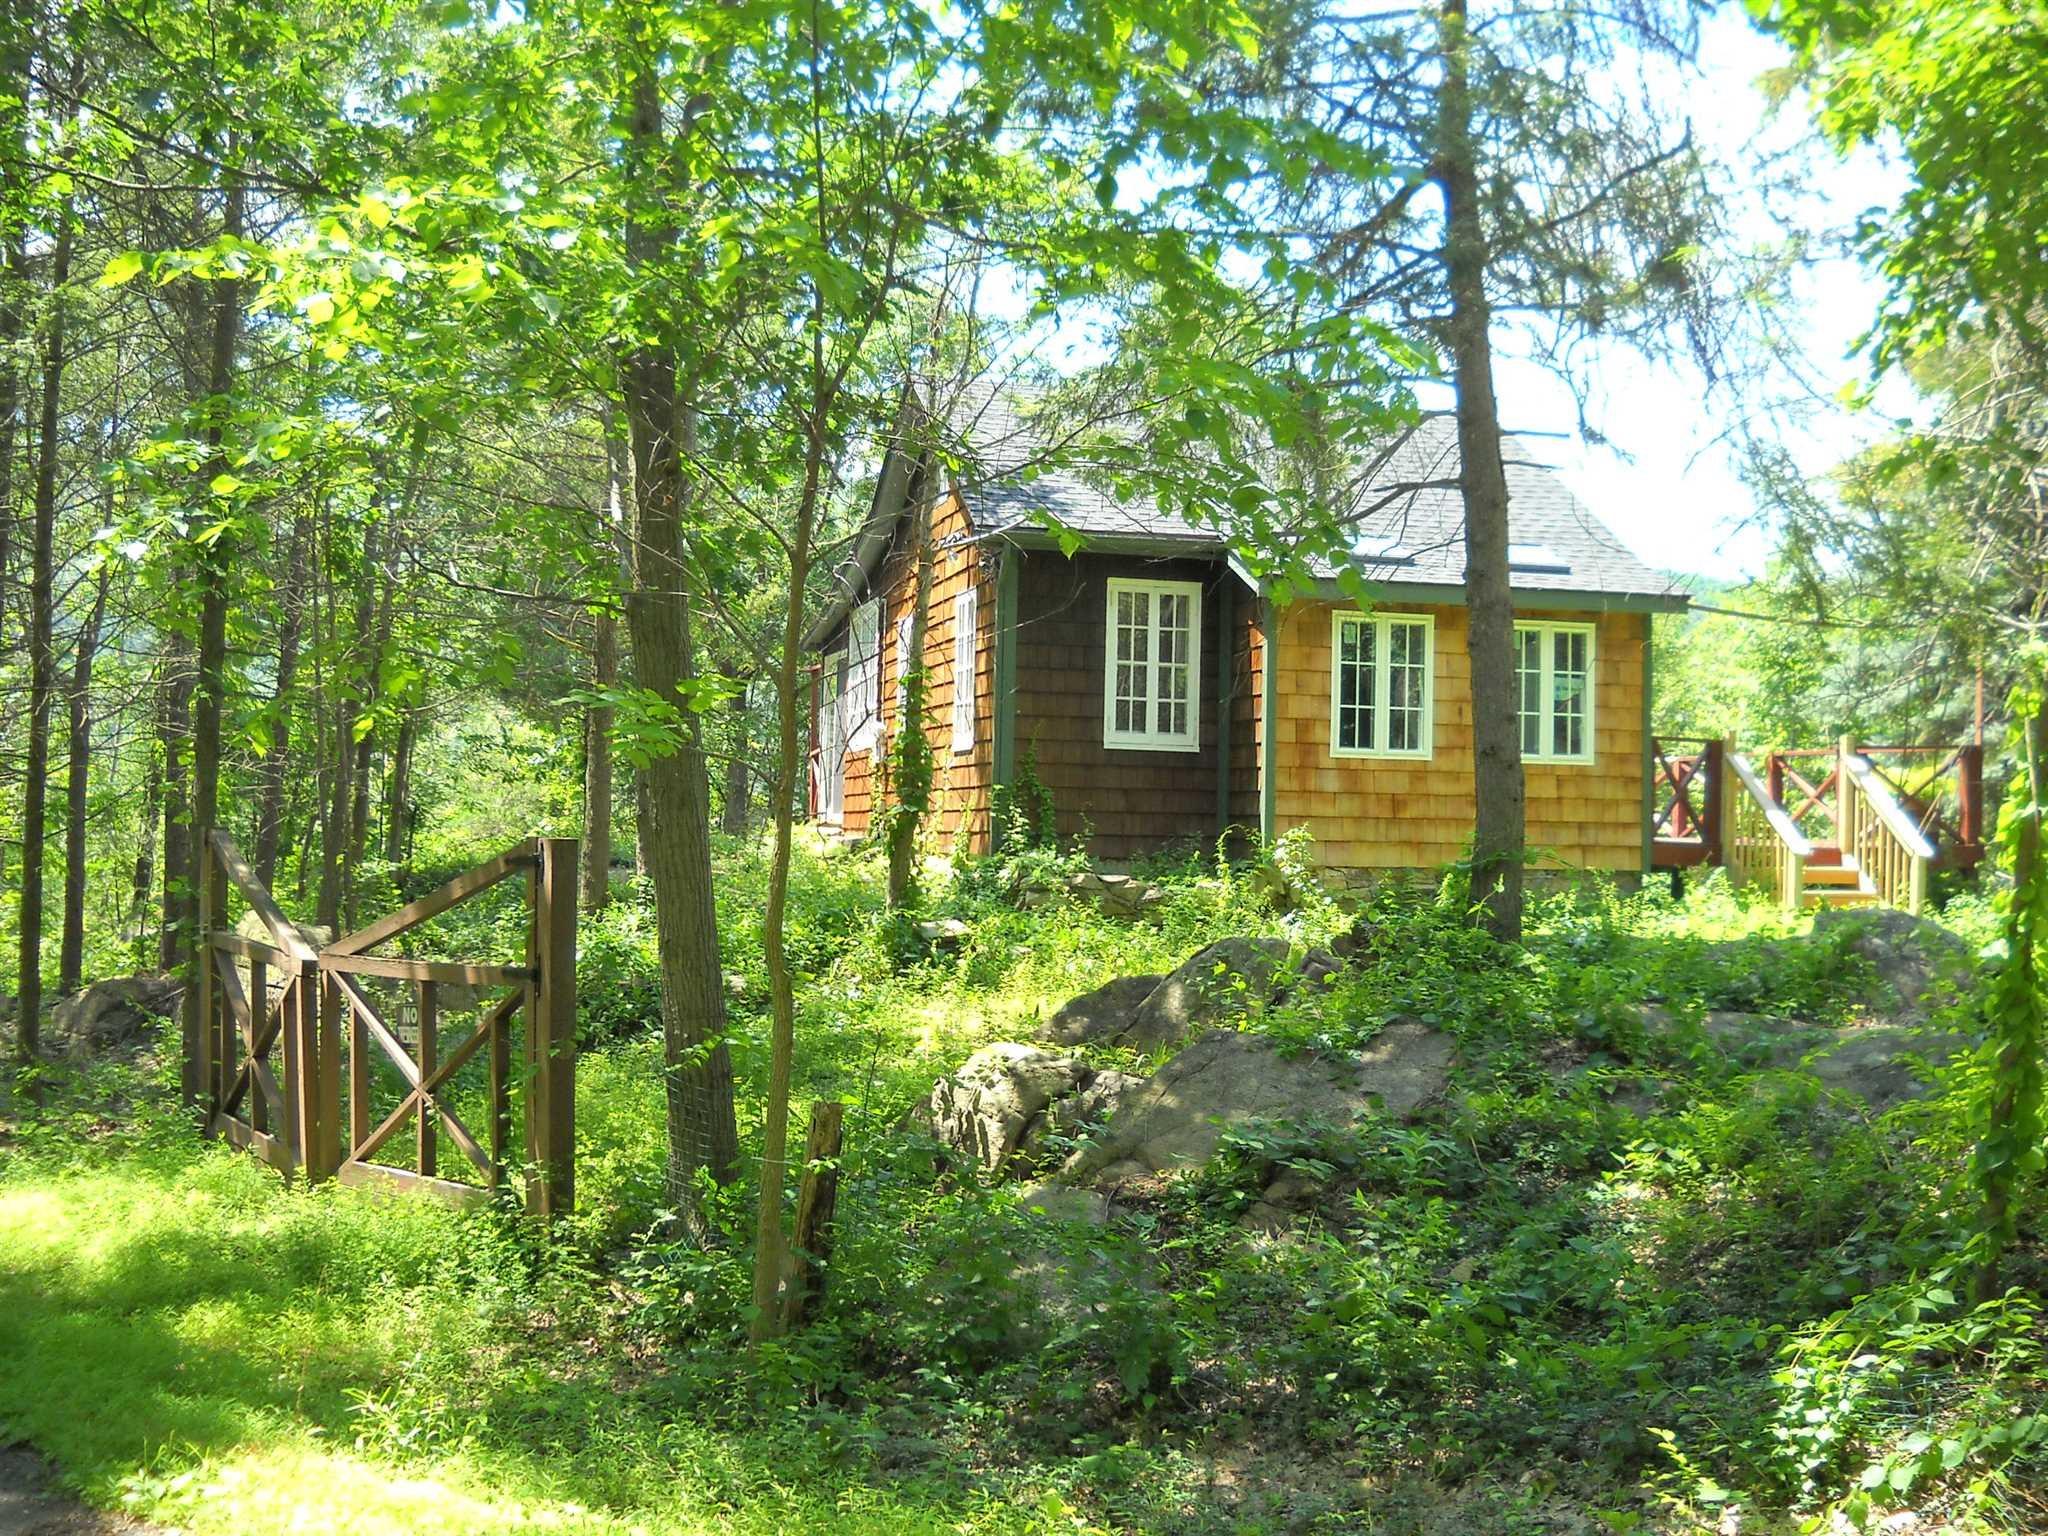 Single Family Home for Sale at 223 RAPALJE 223 RAPALJE Fishkill, New York 12524 United States